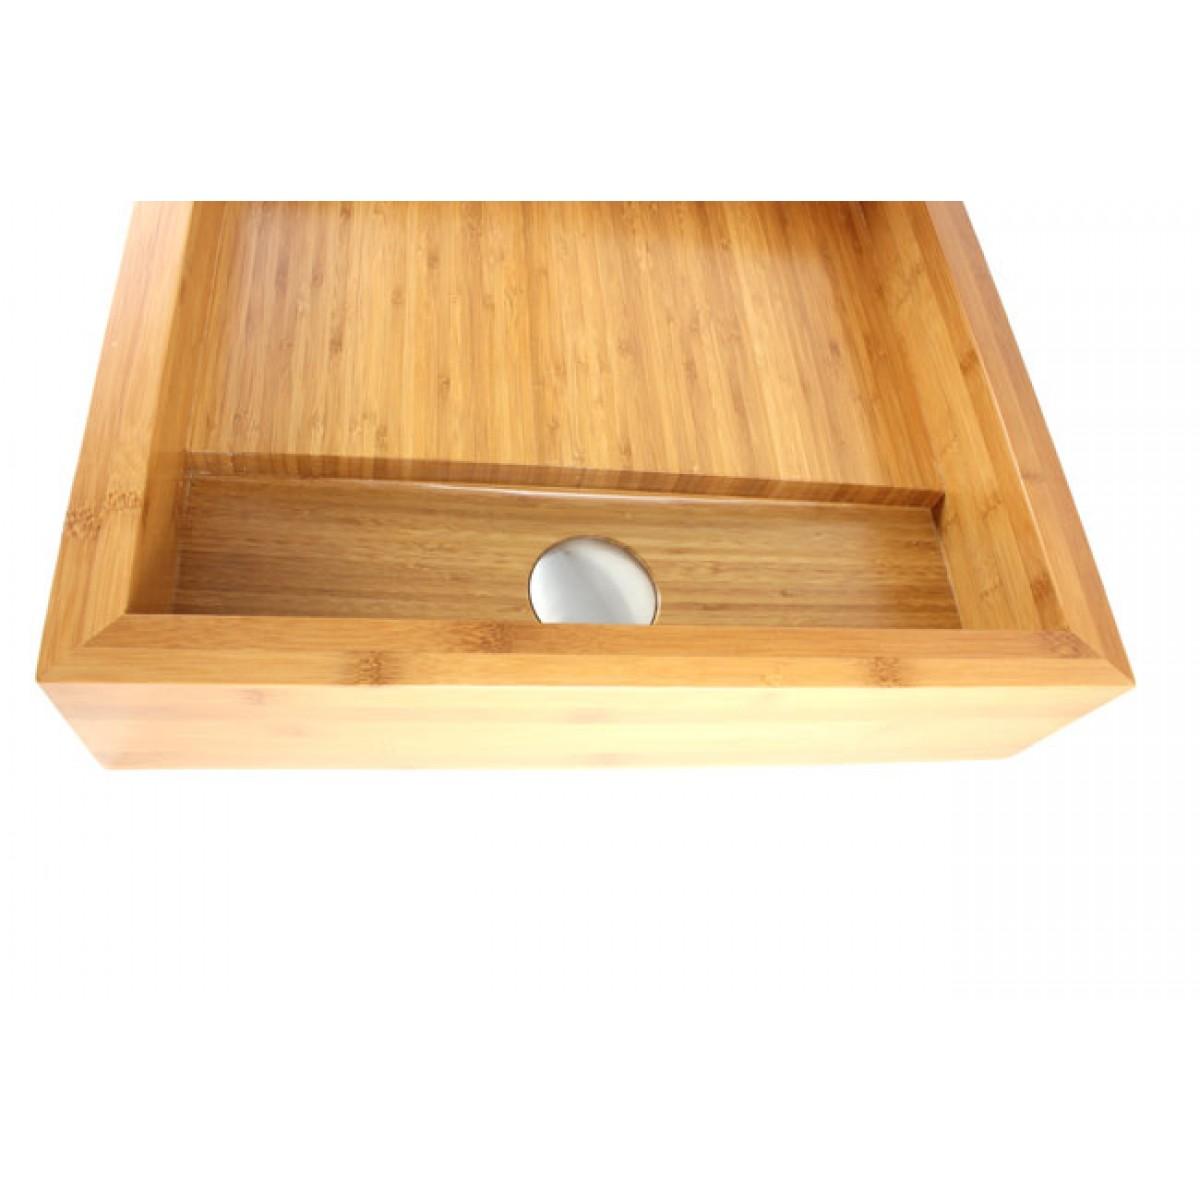 Bathroom Sink 19 X 17 pure - bamboo countertop bathroom lavatory vessel sink - 19 x 17 x